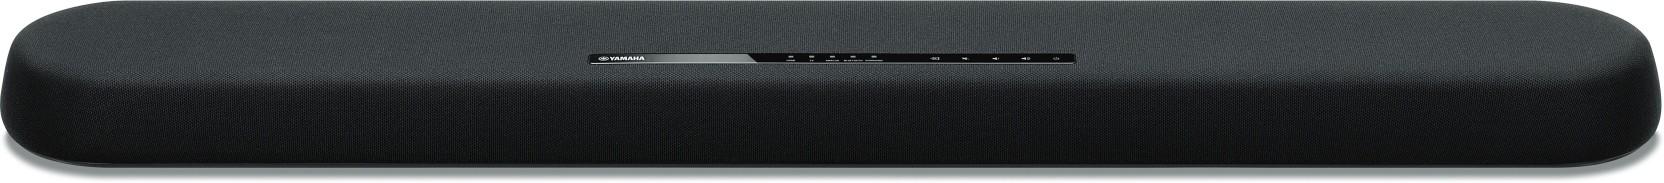 Buy Yamaha YAS-108 120 Bluetooth Soundbar Online from